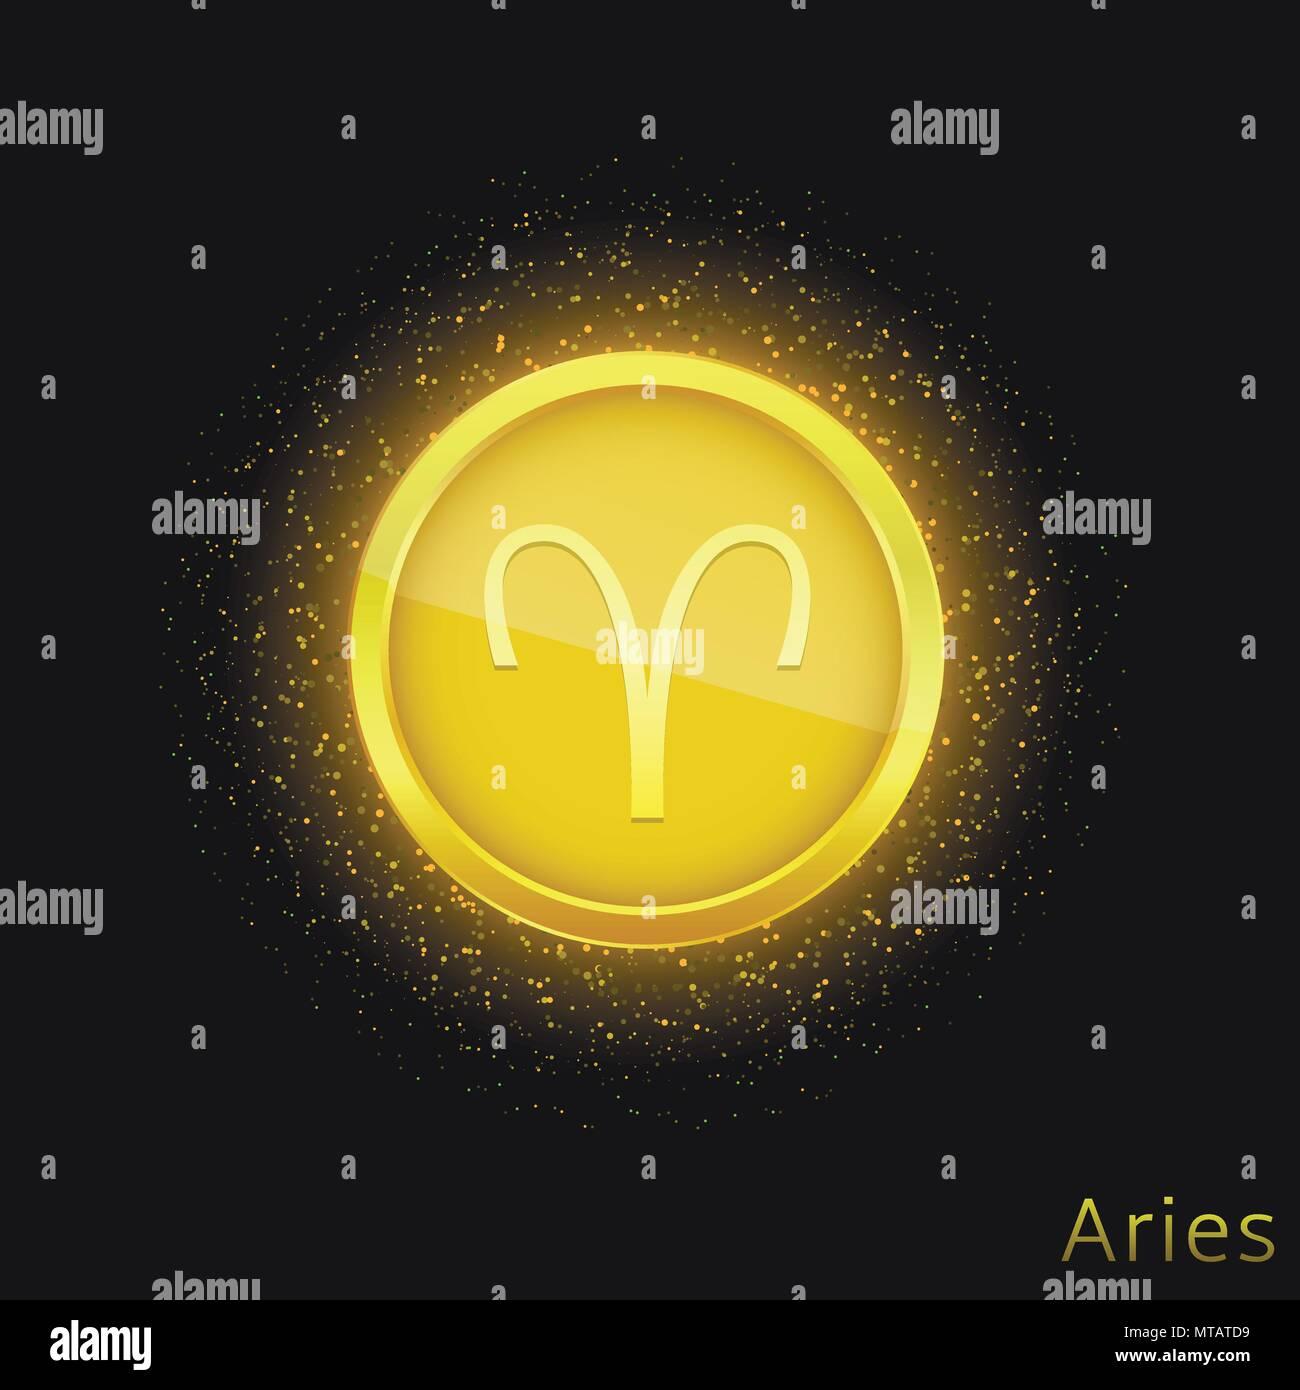 Golden Aries Sign Stock Vector Art Illustration Vector Image